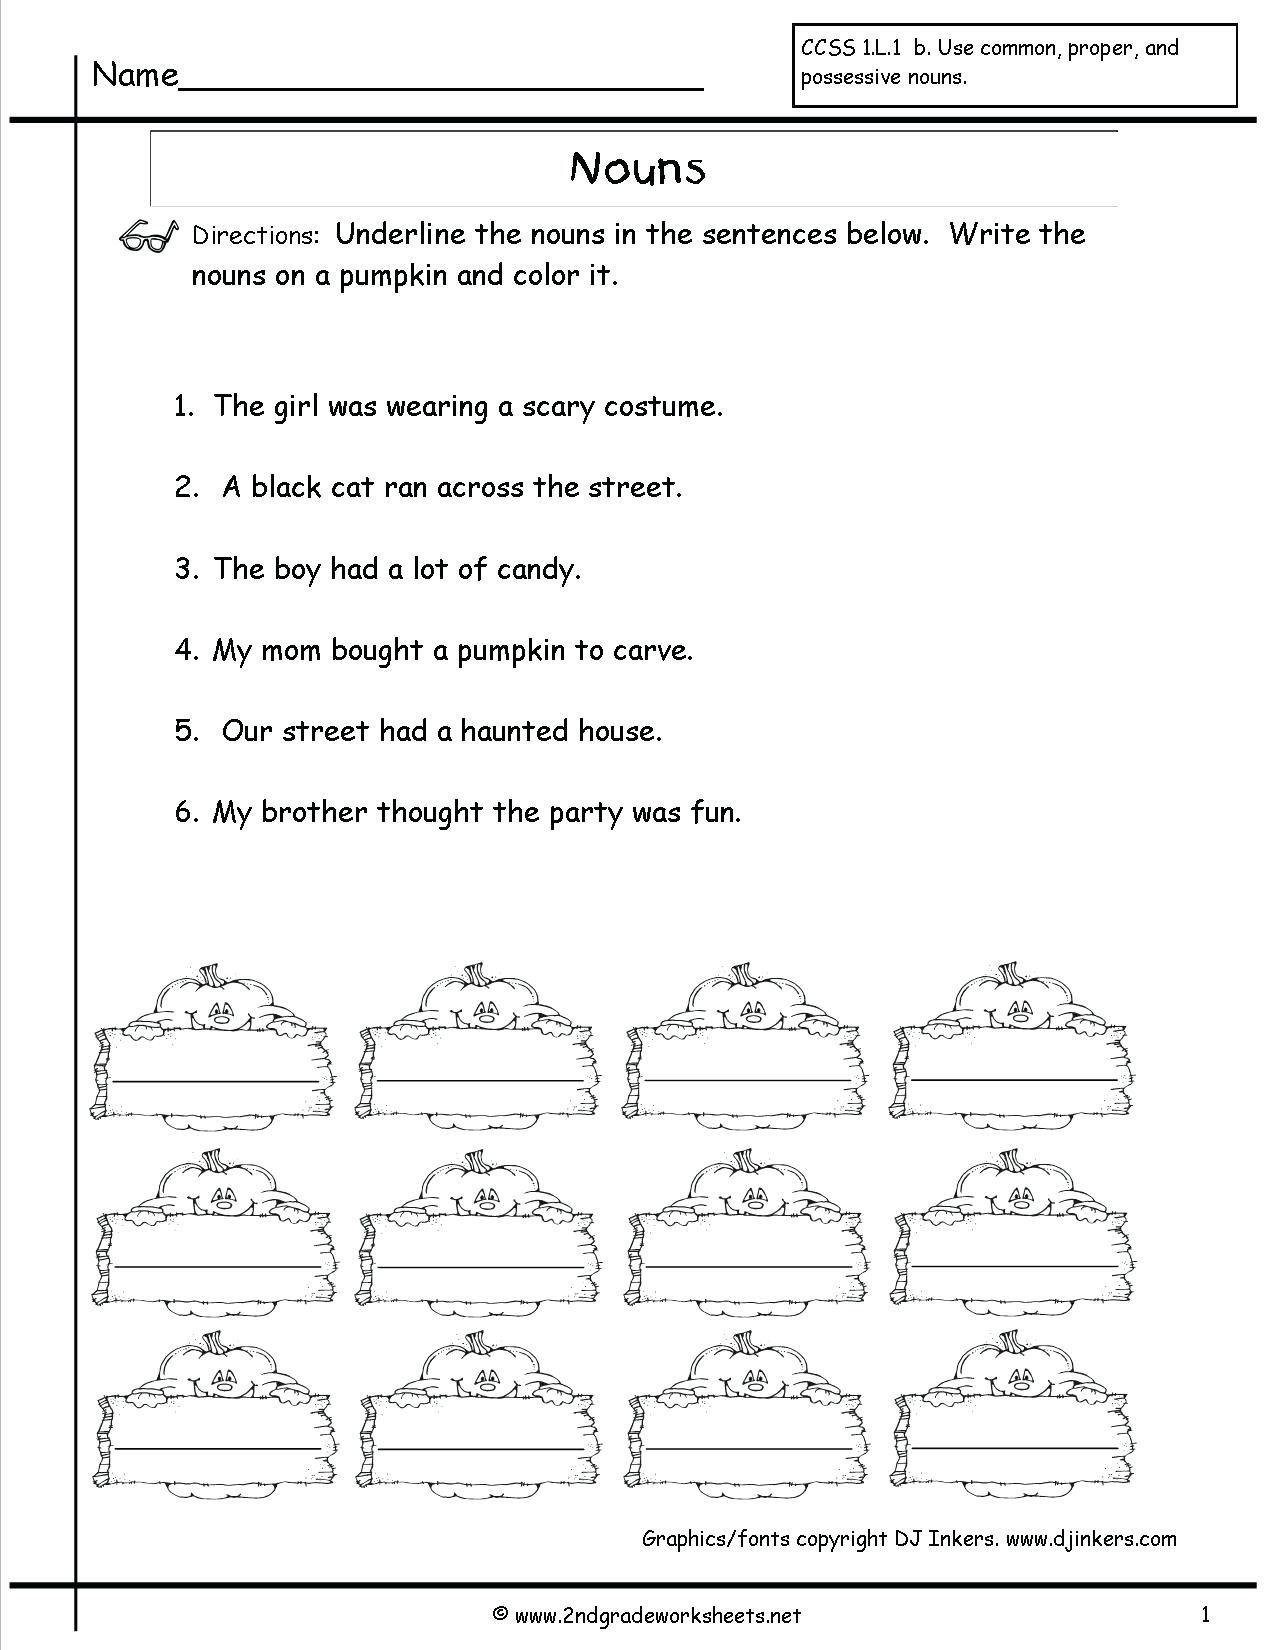 37 Clever Possessive Nouns Worksheets Design